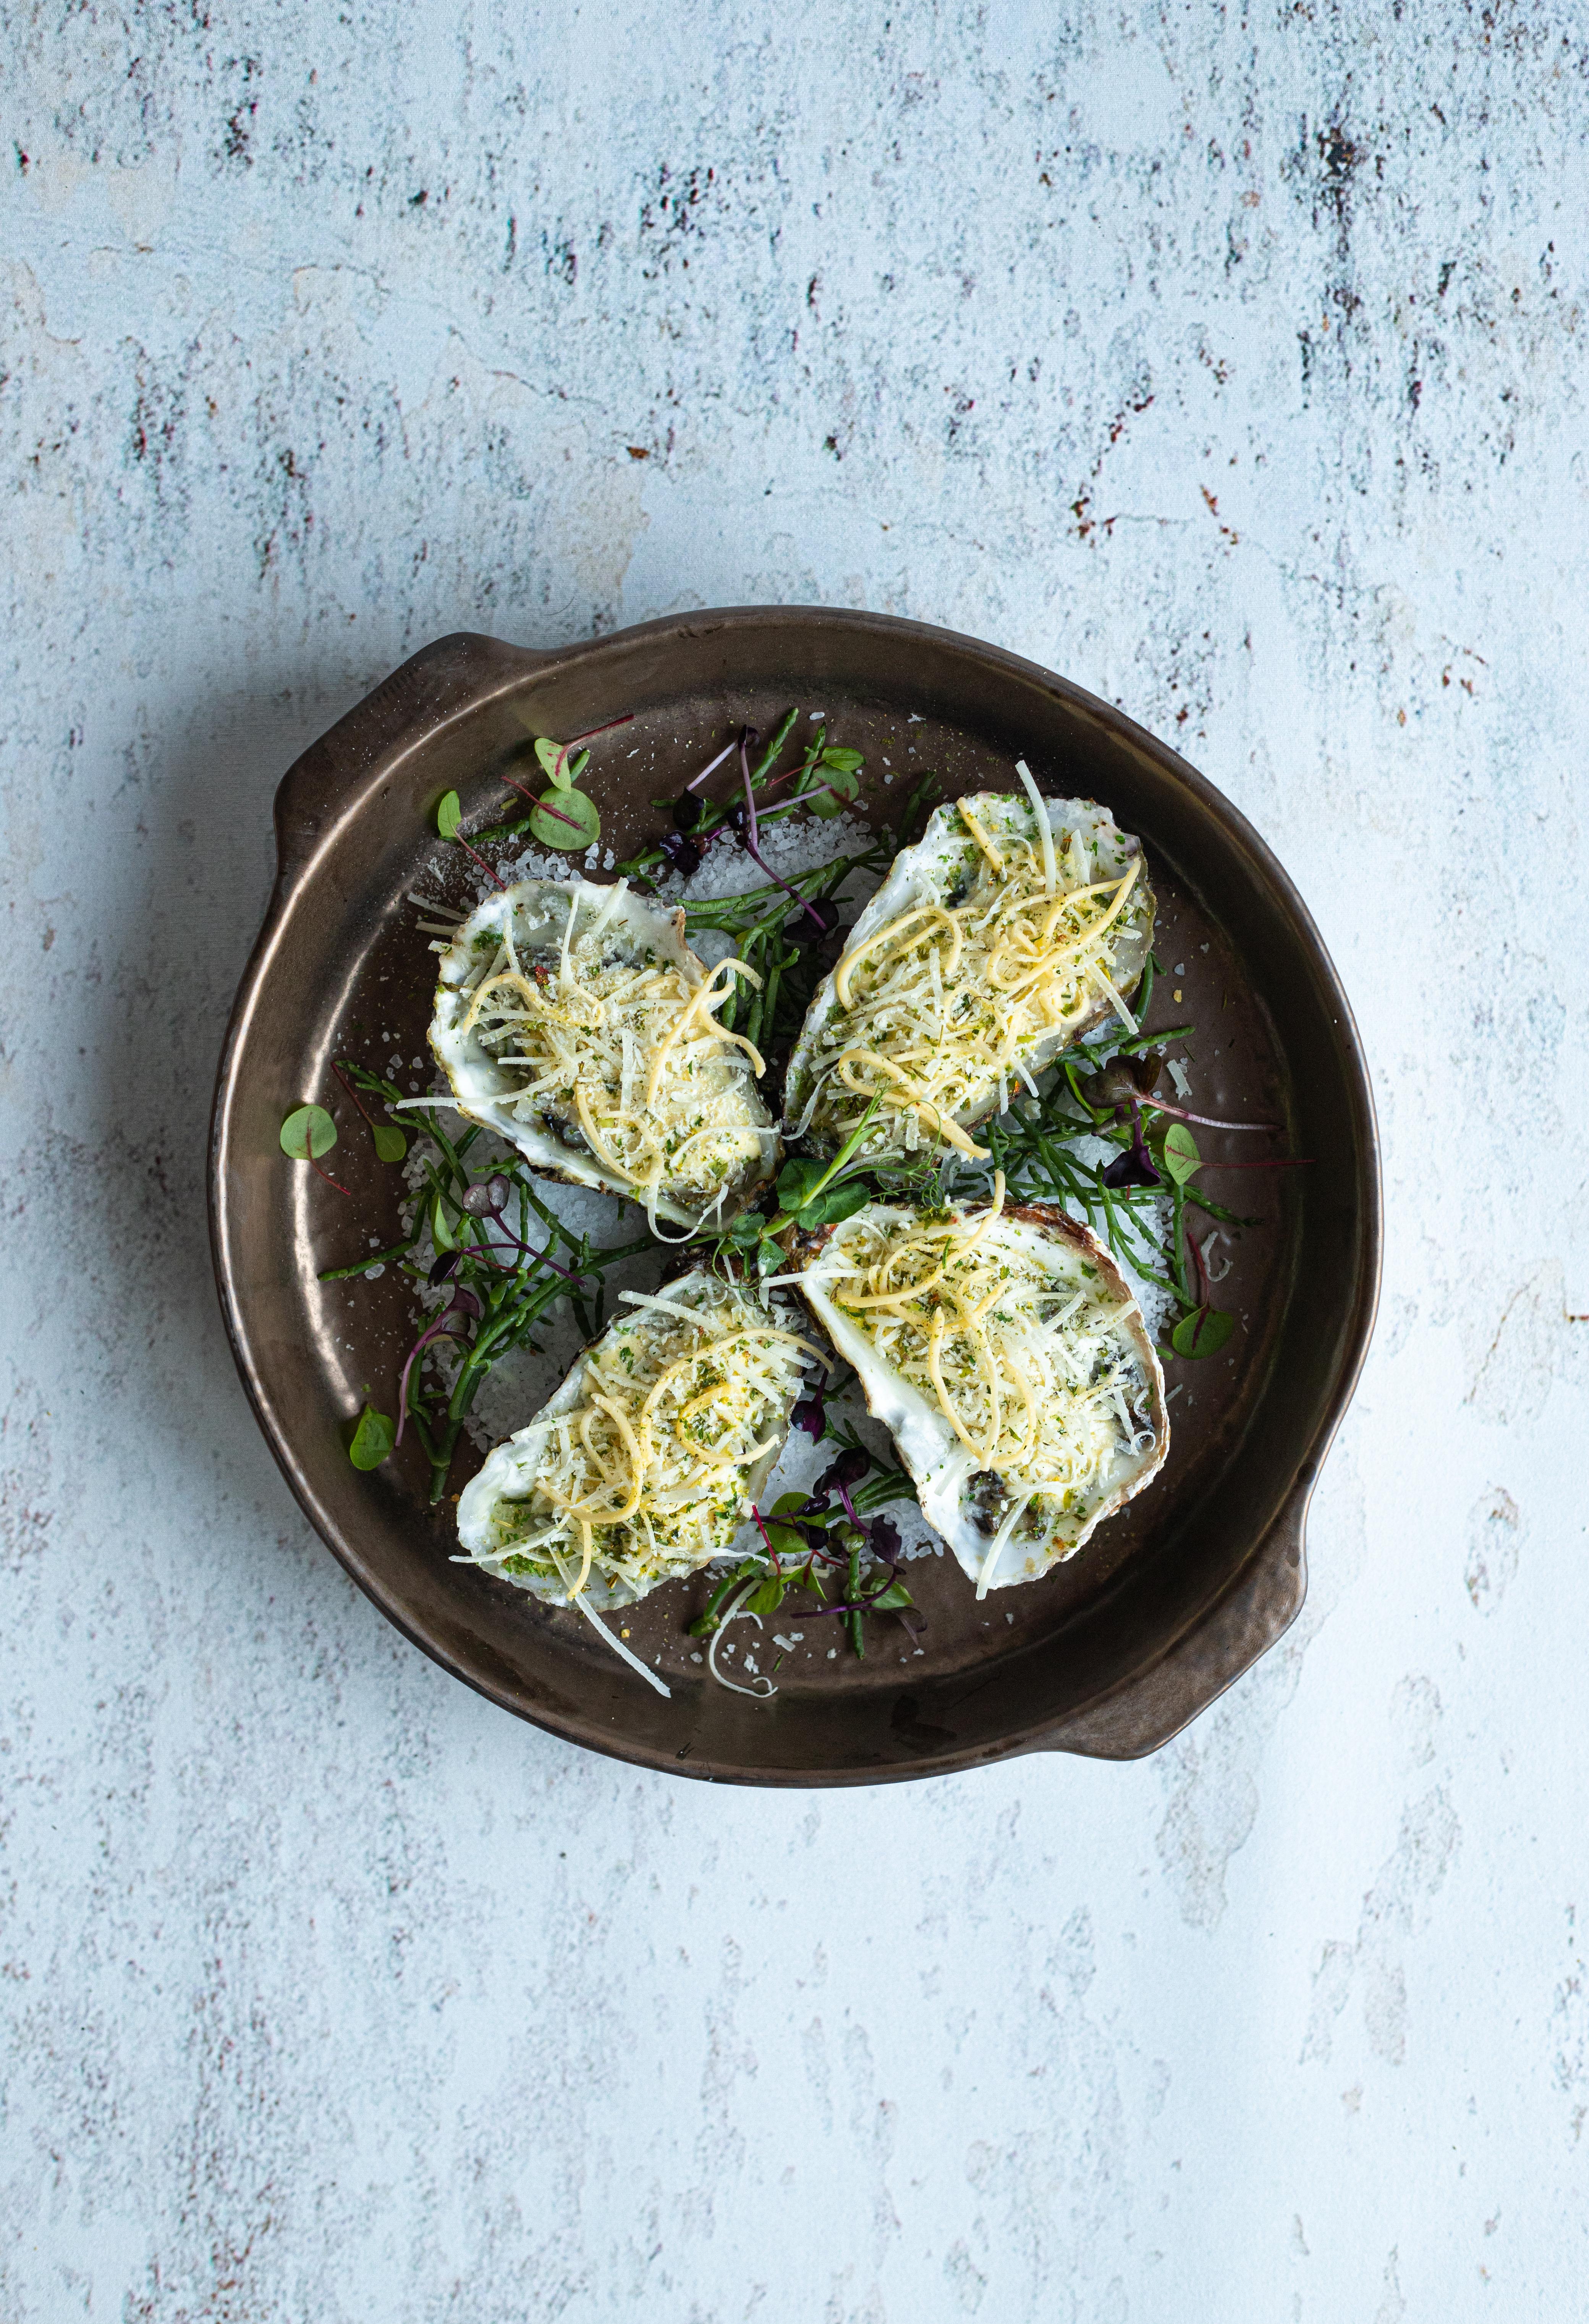 Gegratineerde oesters 4 stuks